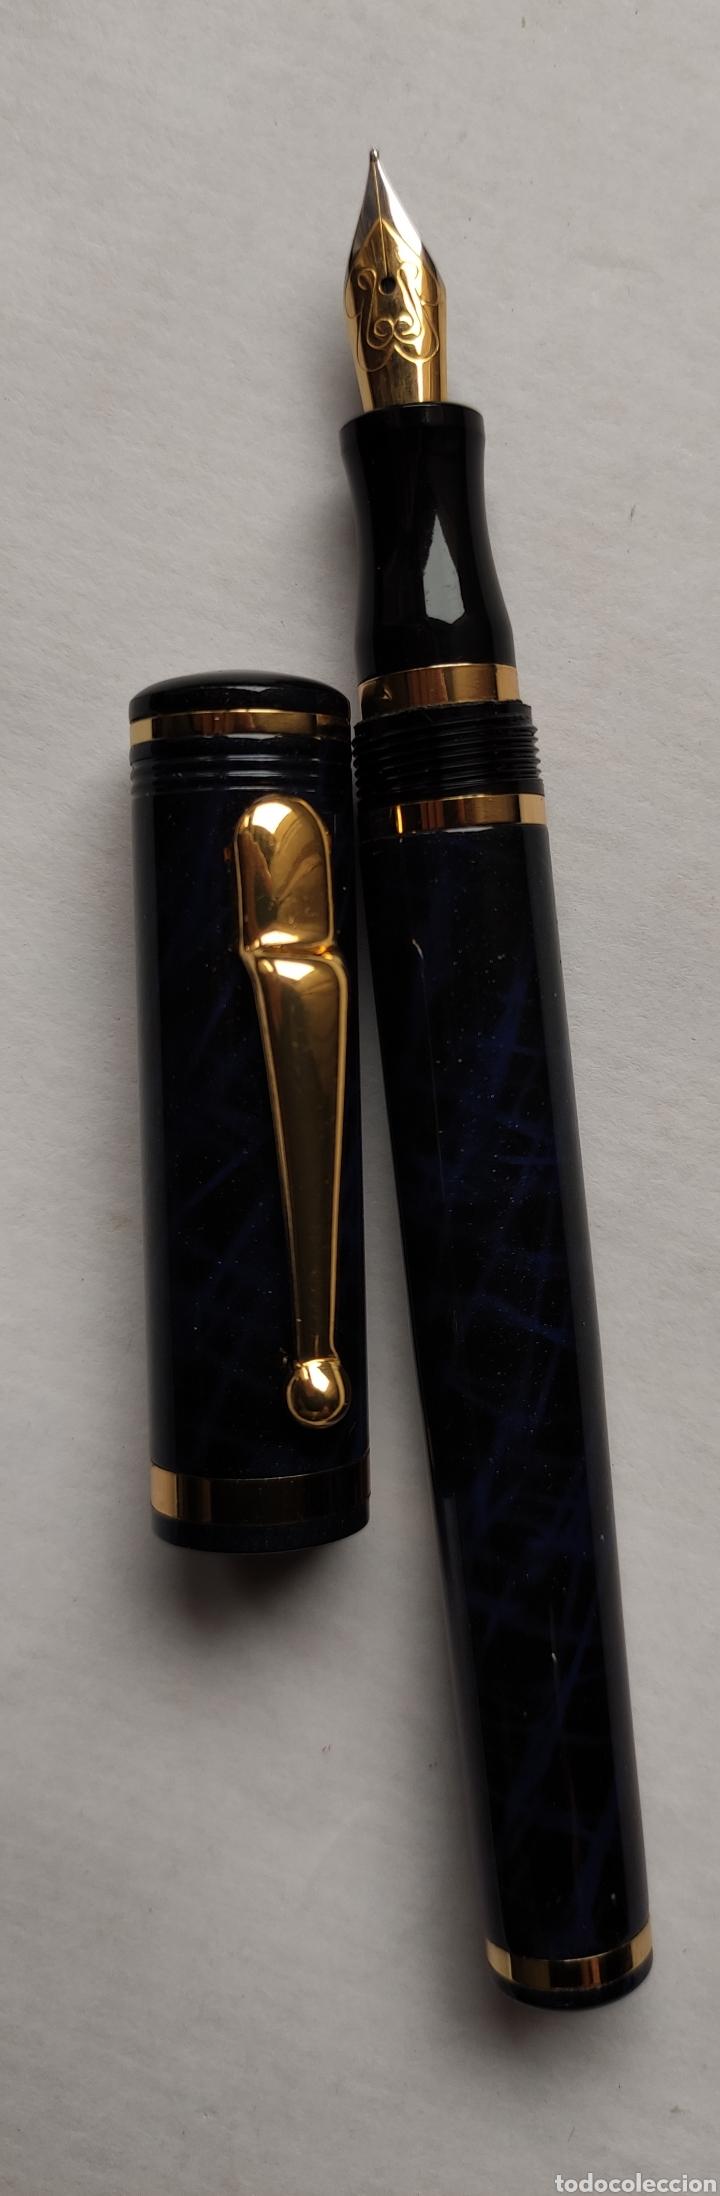 Plumas estilográficas antiguas: Estuche madera y 2 plumas estilográficas - Foto 4 - 258087115